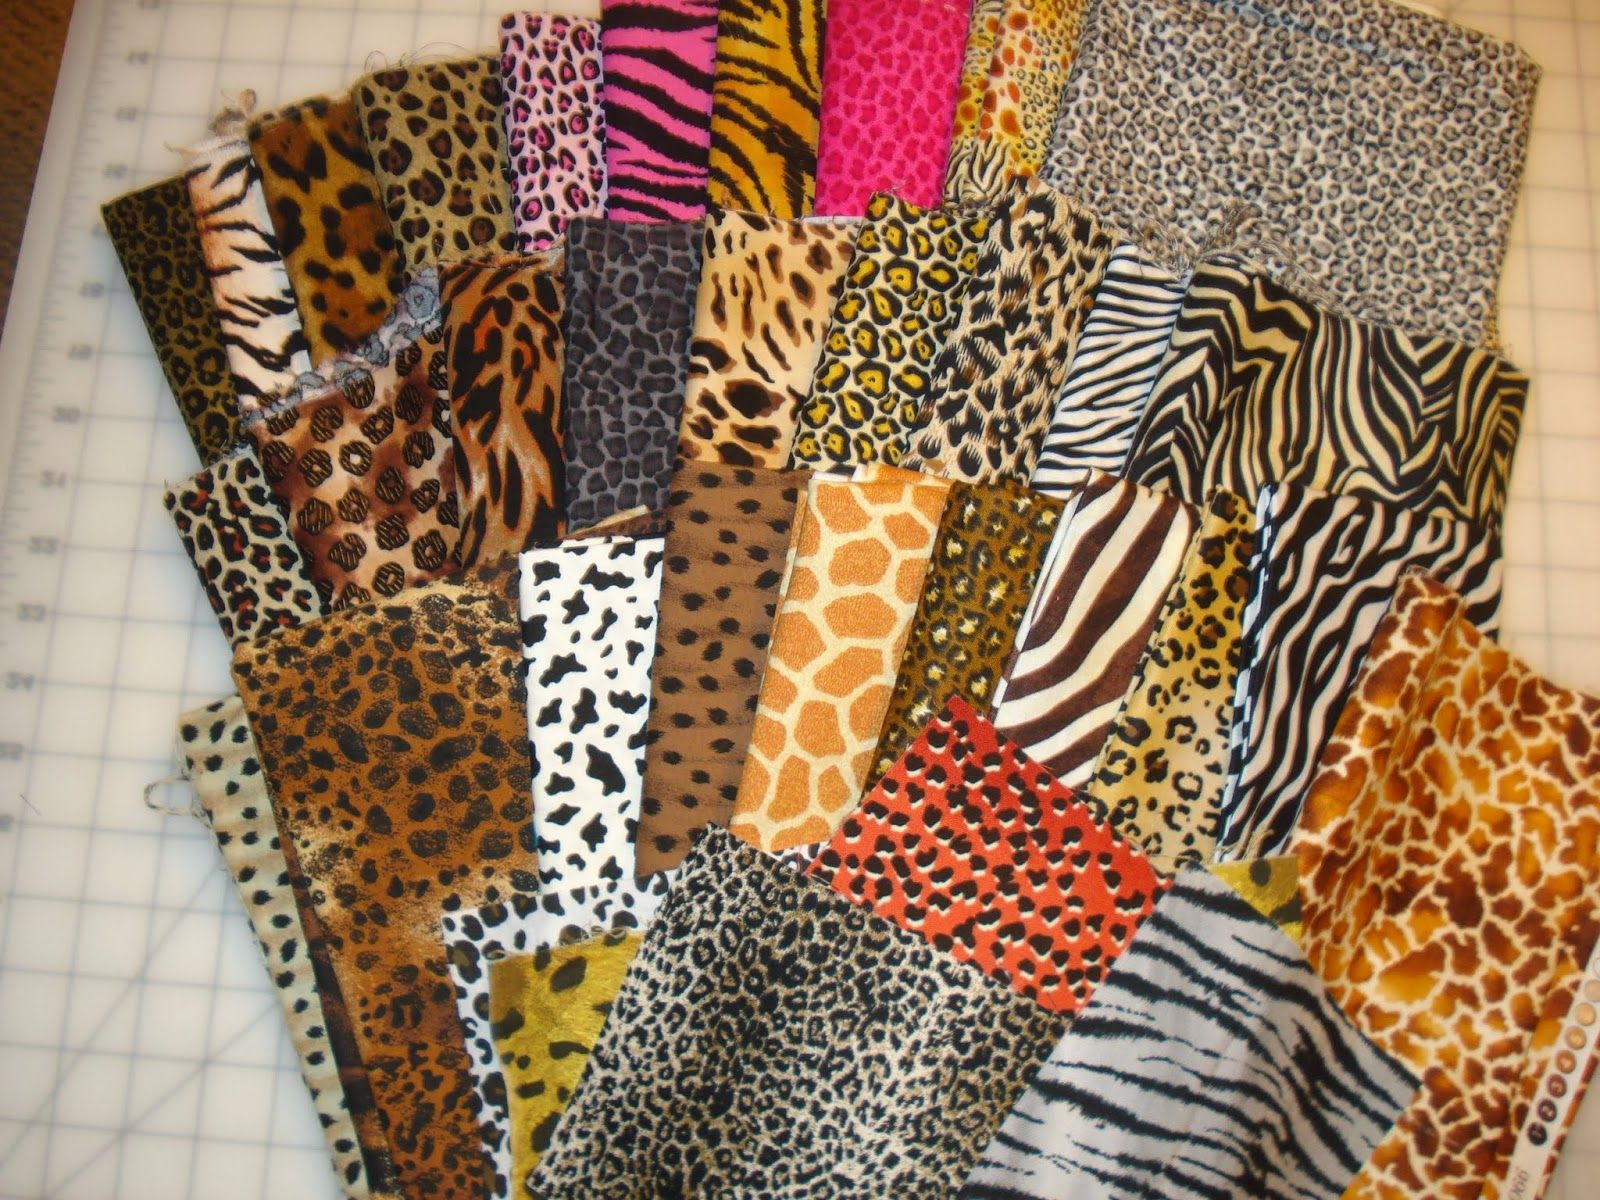 Animal Print Quilt   enough animal-print fabrics for DGD's high ... : animal print quilt patterns - Adamdwight.com